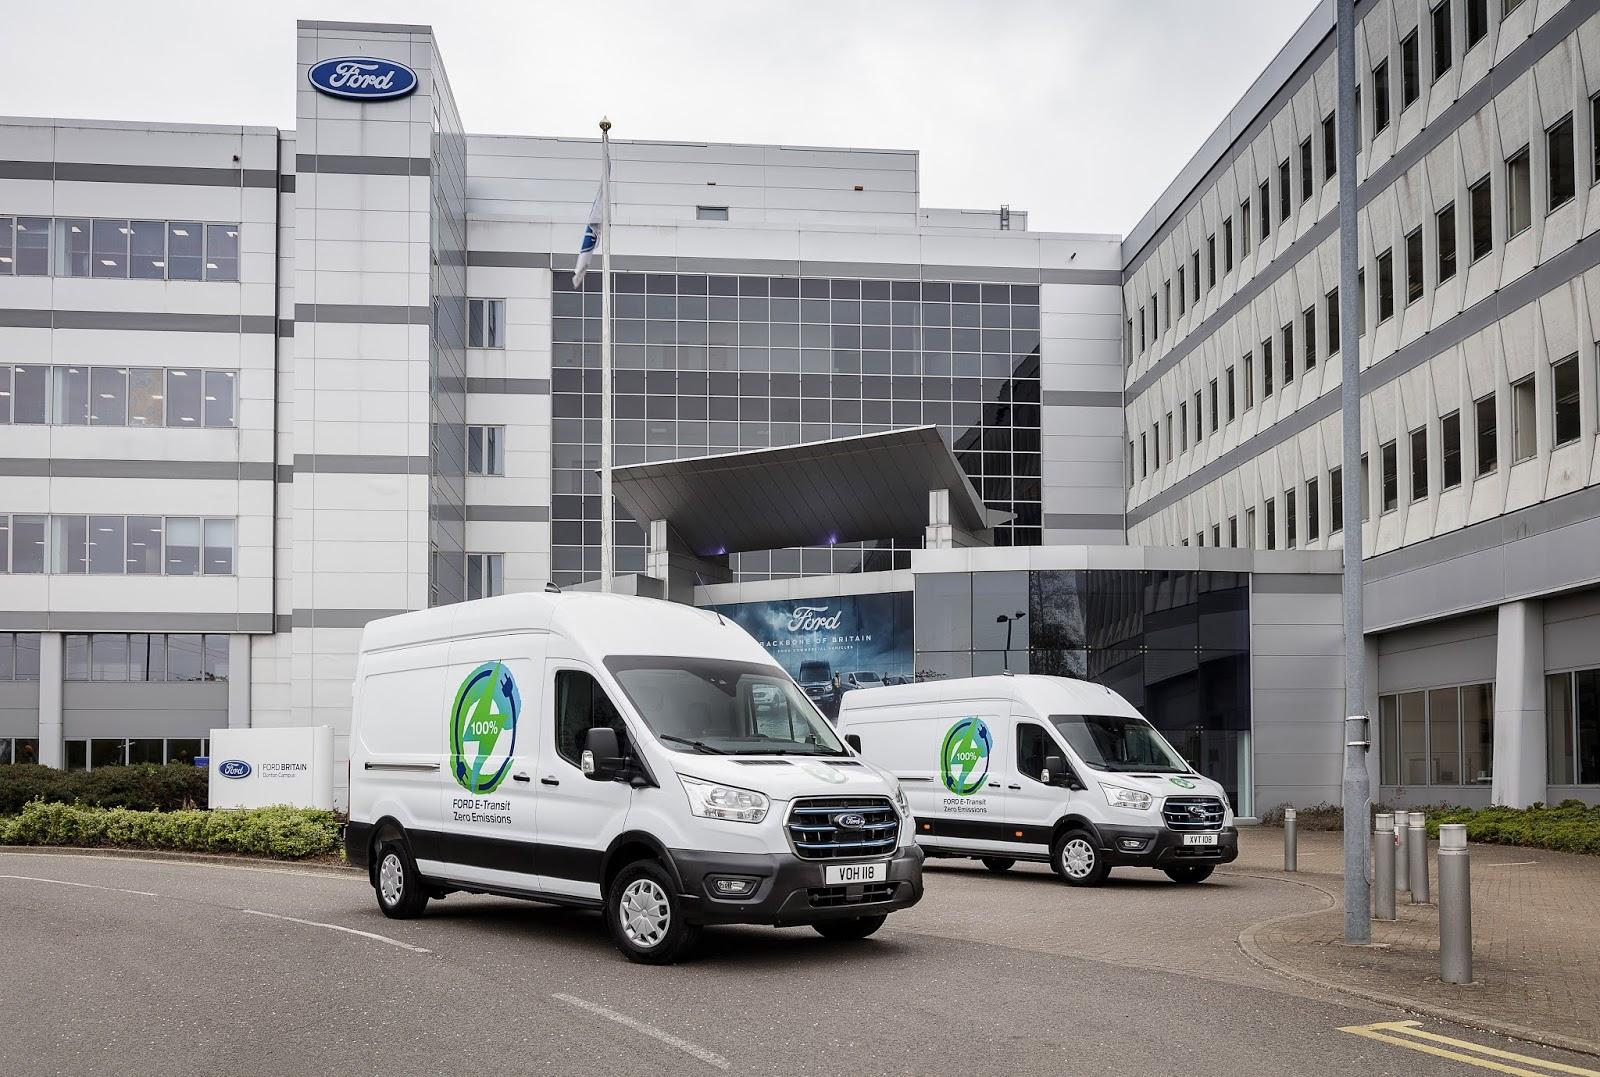 E TRANSIT TRIALS FLEET PROTOTYPES 1 Ford : Πρόγραμμα δοκιμών με Ευρωπαίους πελάτες για το νέο αμιγώς ηλεκτρικό E-Transit Van (& videos)